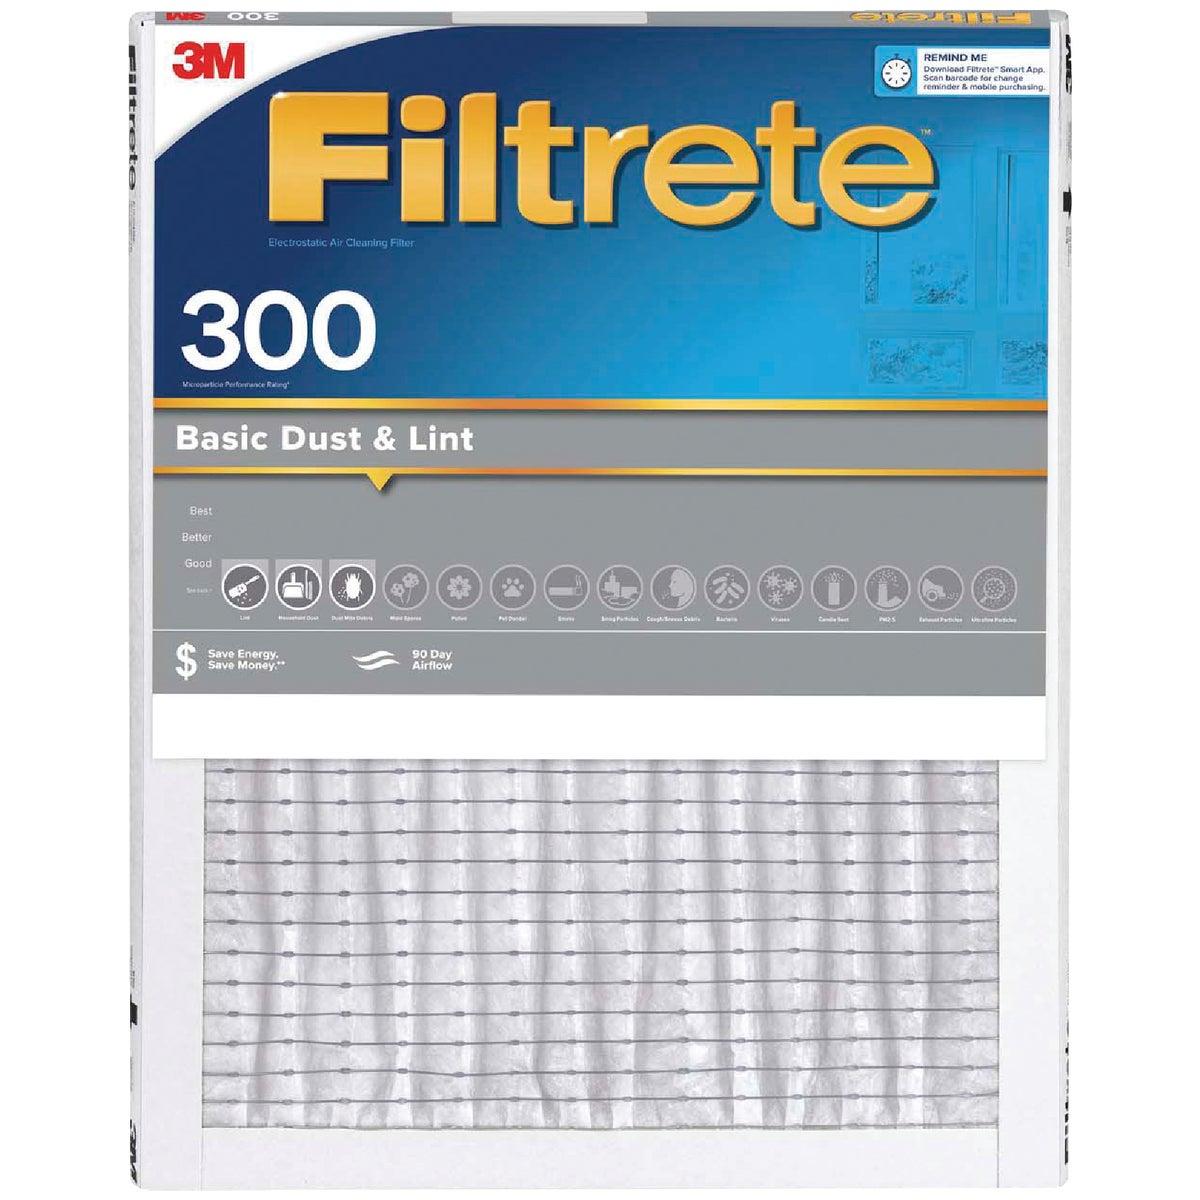 3M Filtrete 20 In. x 30 In. x 1 In. Dust Reduction 300 MPR Furnace Filter